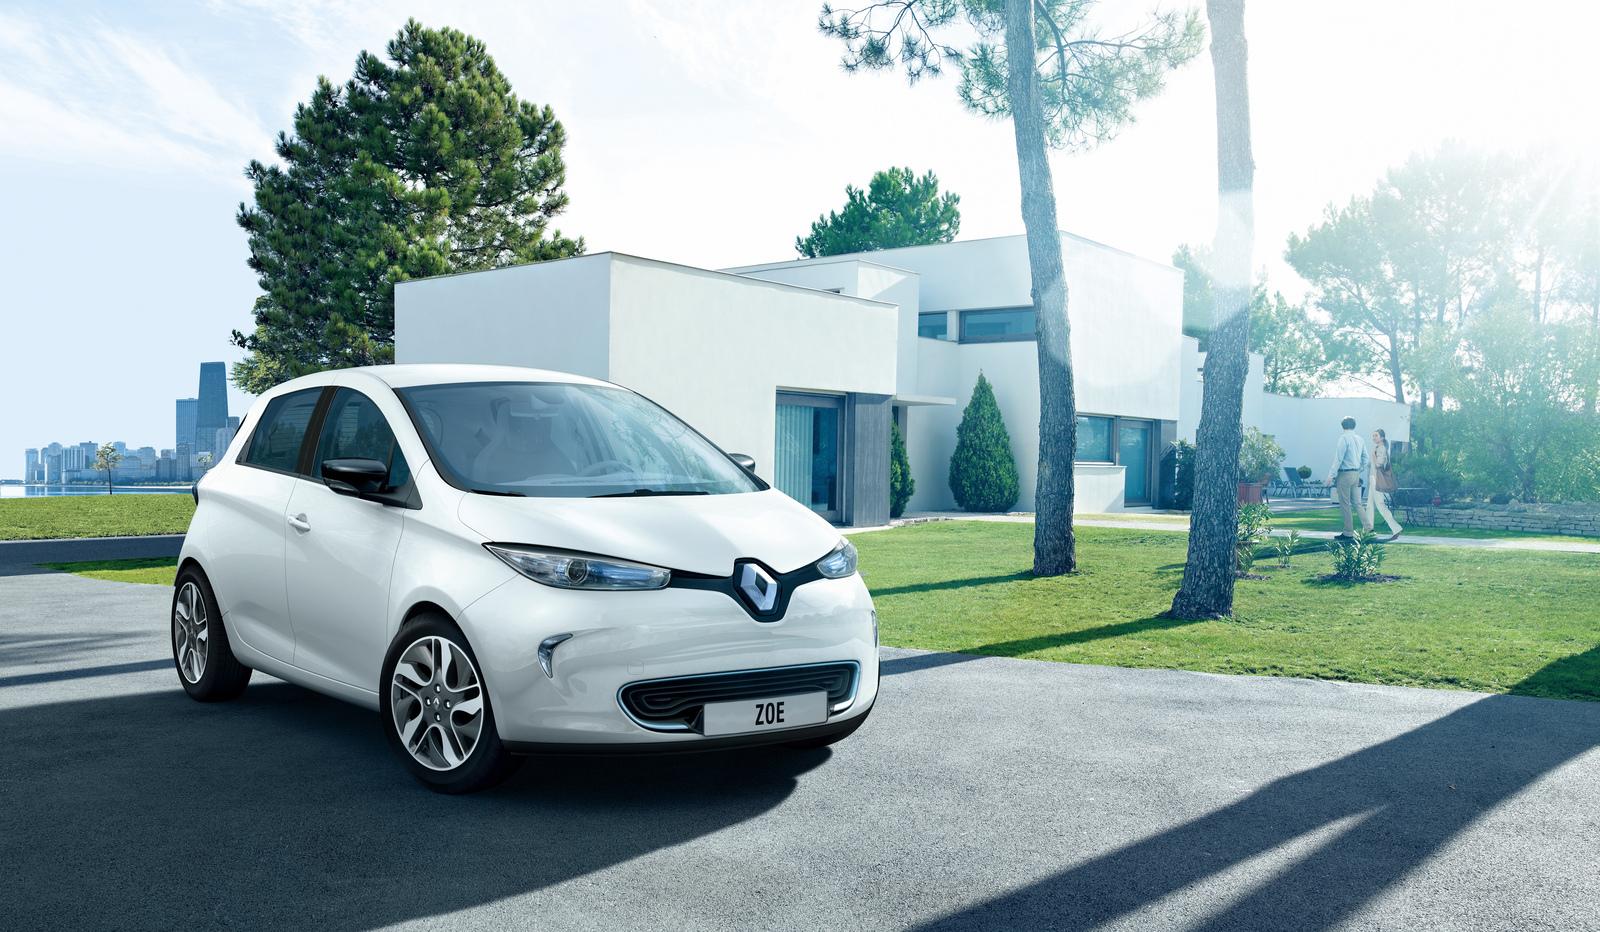 Zoe (Image: Renault)